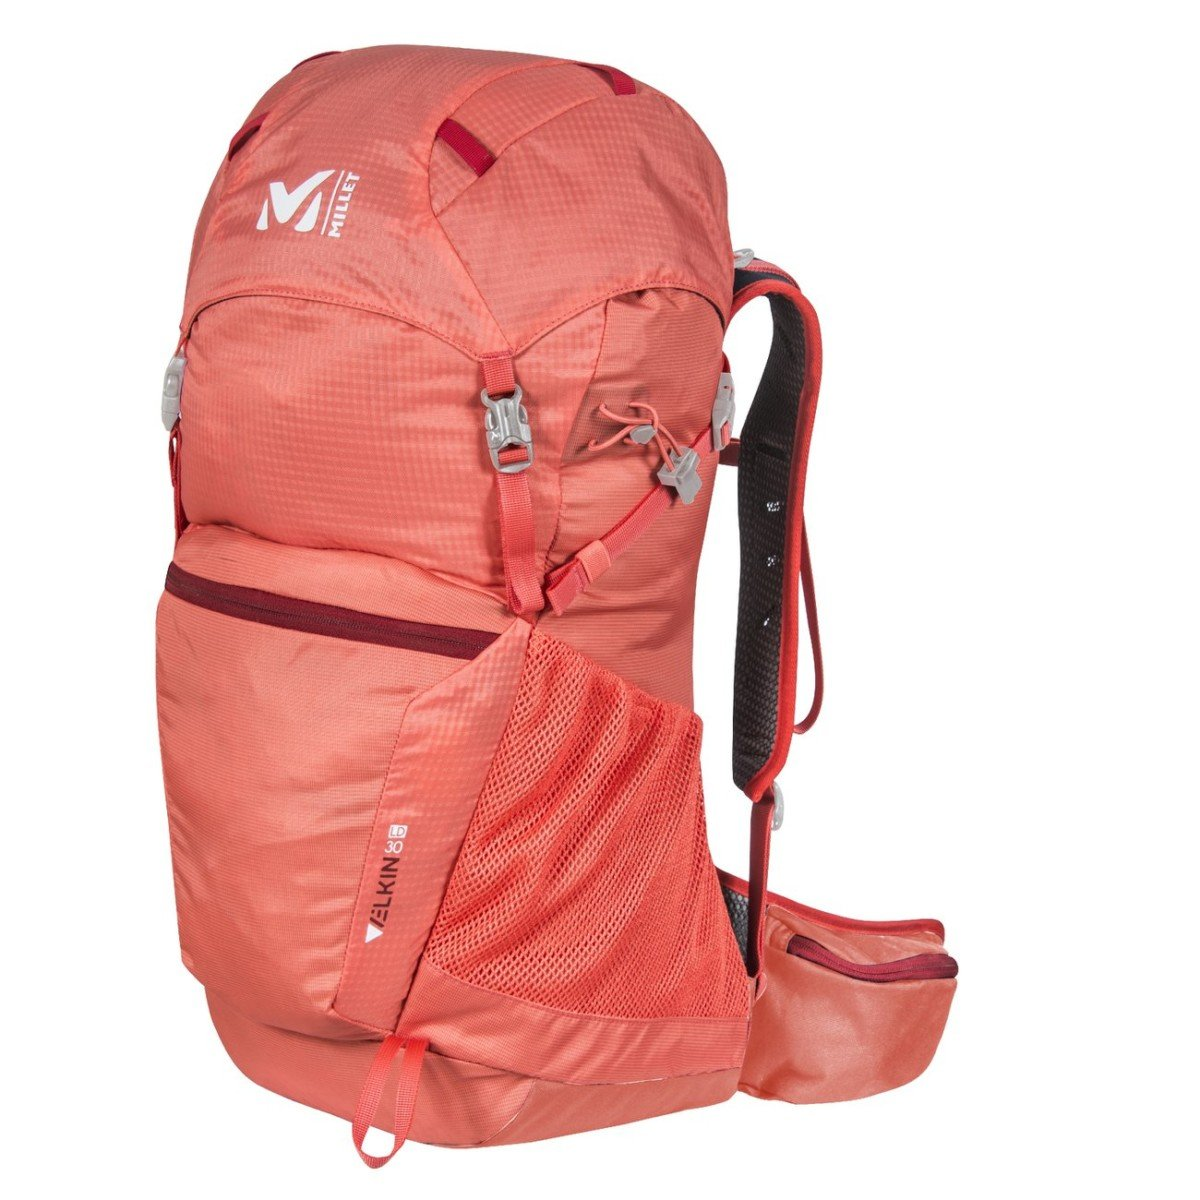 Millet Welkin 30LD, sac à dos randonnée femme. -